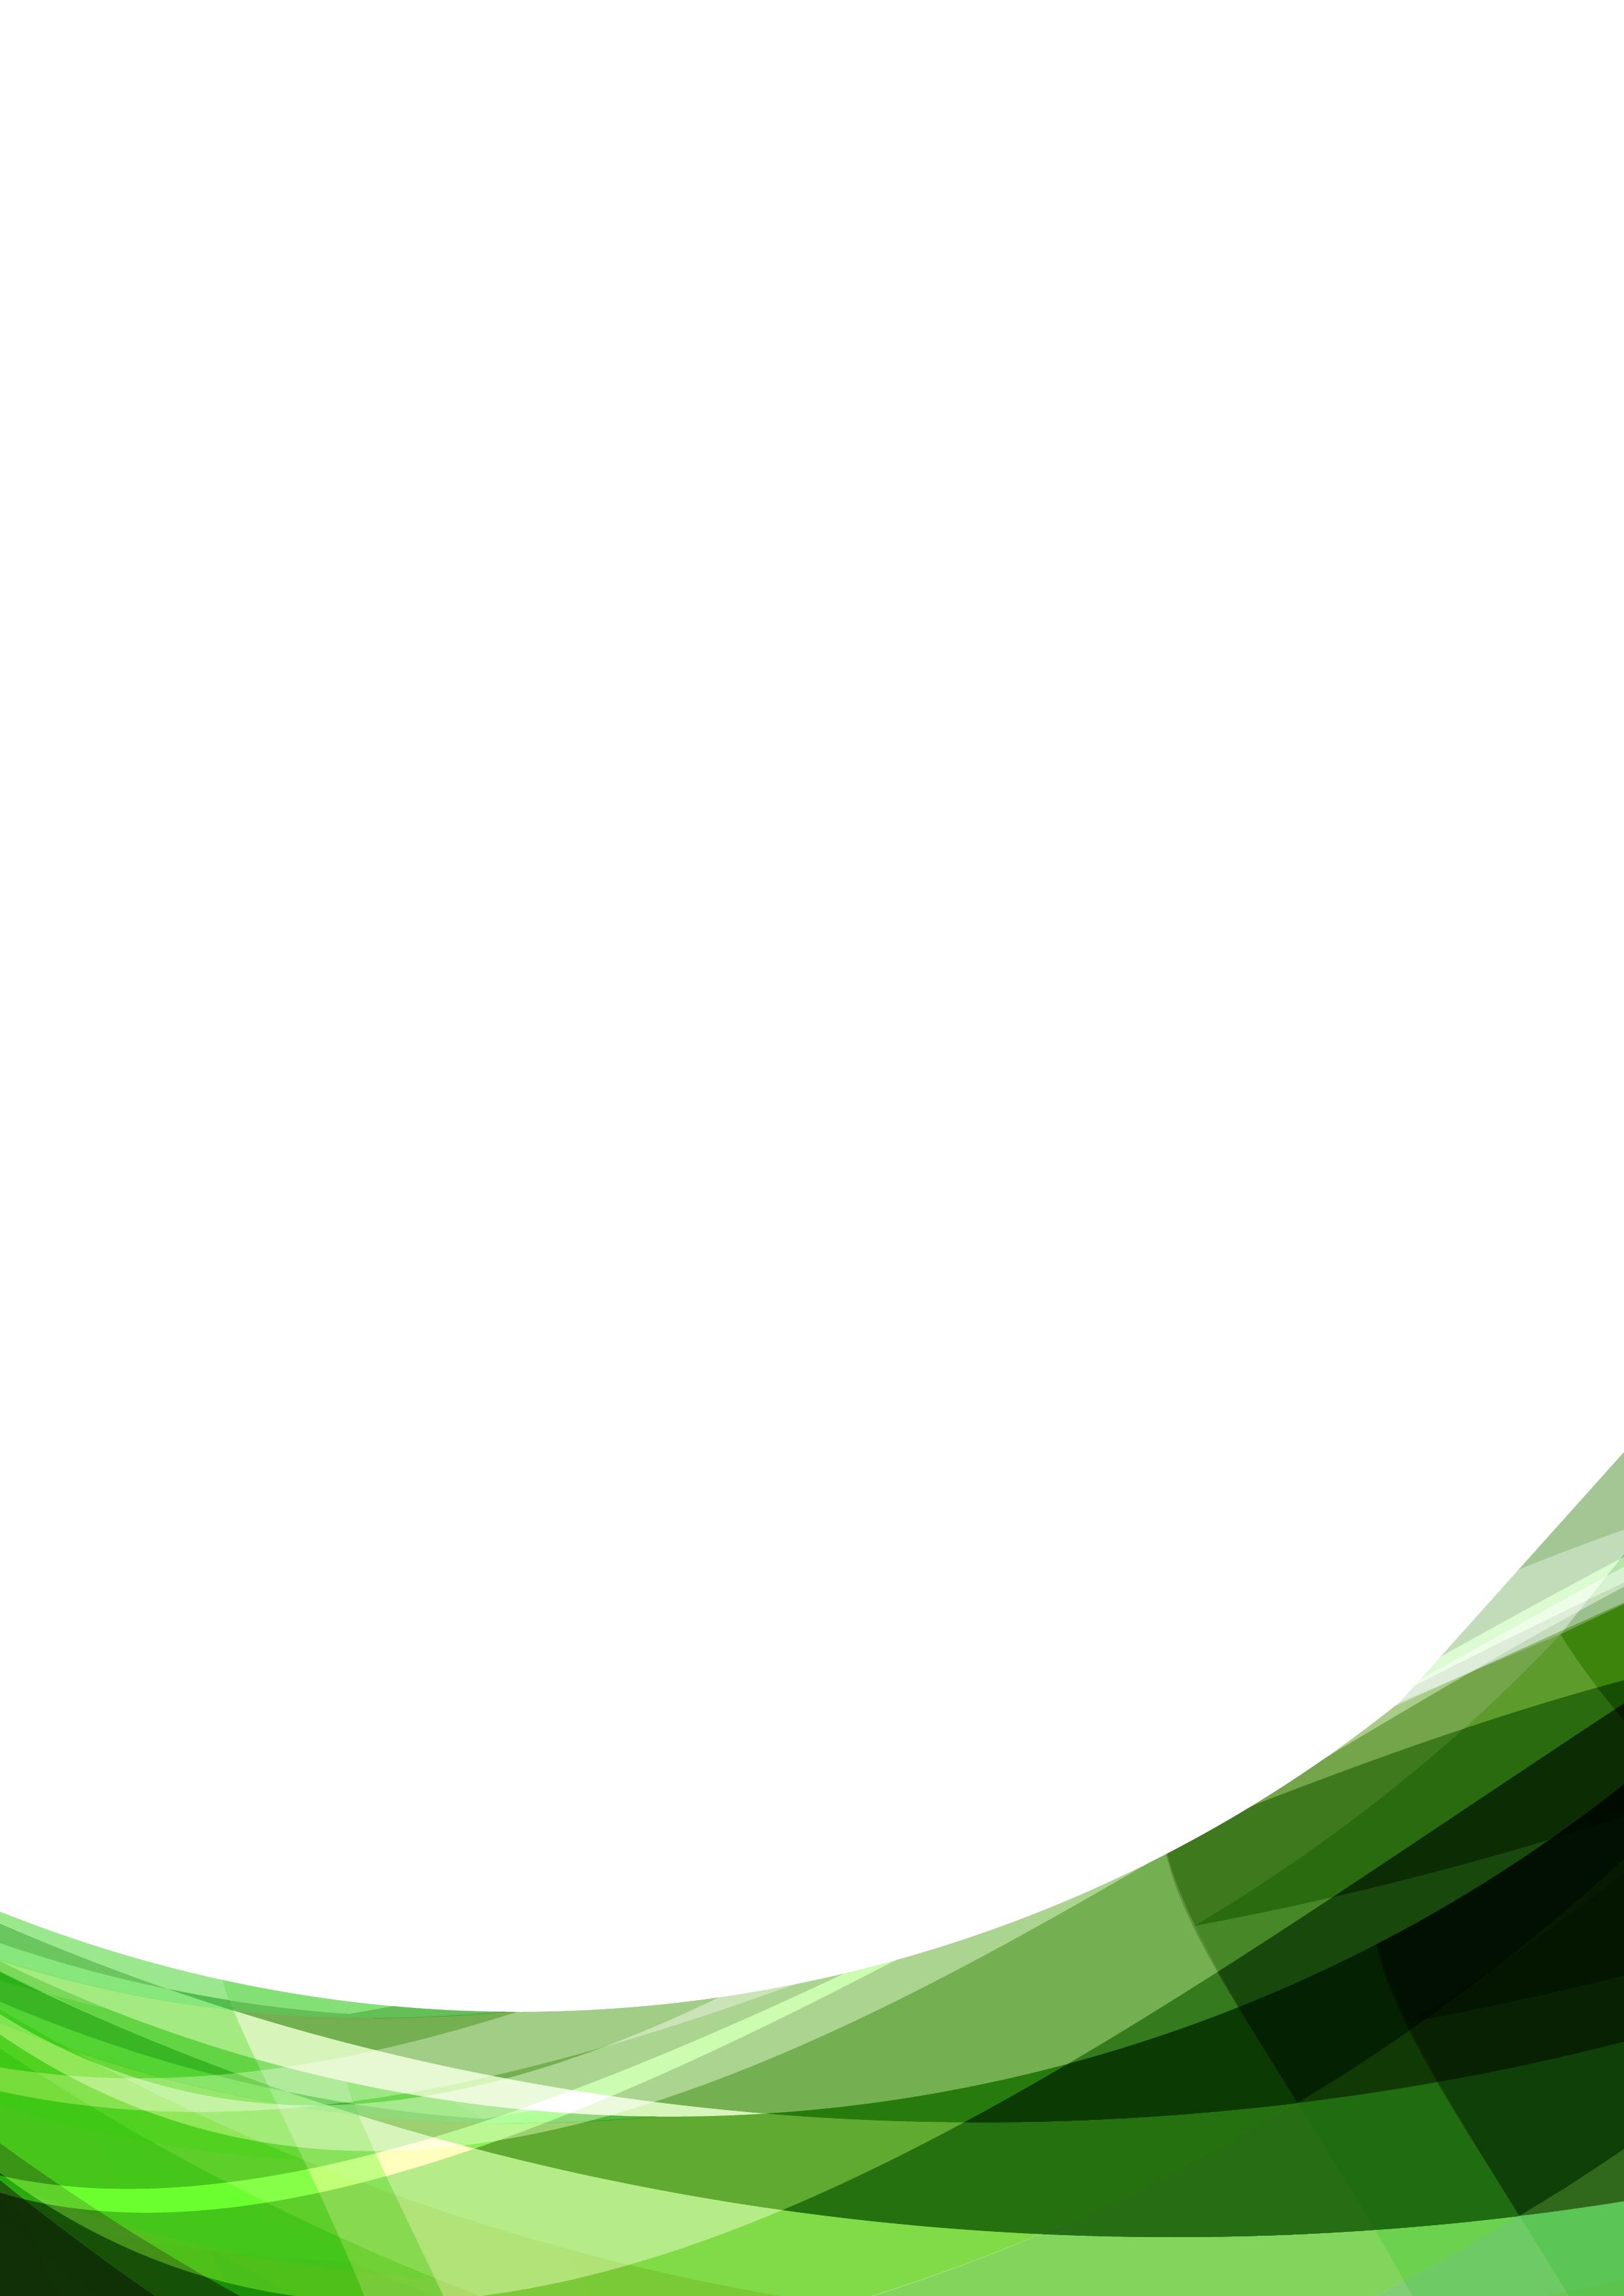 Download Green Background Transparent PNG.